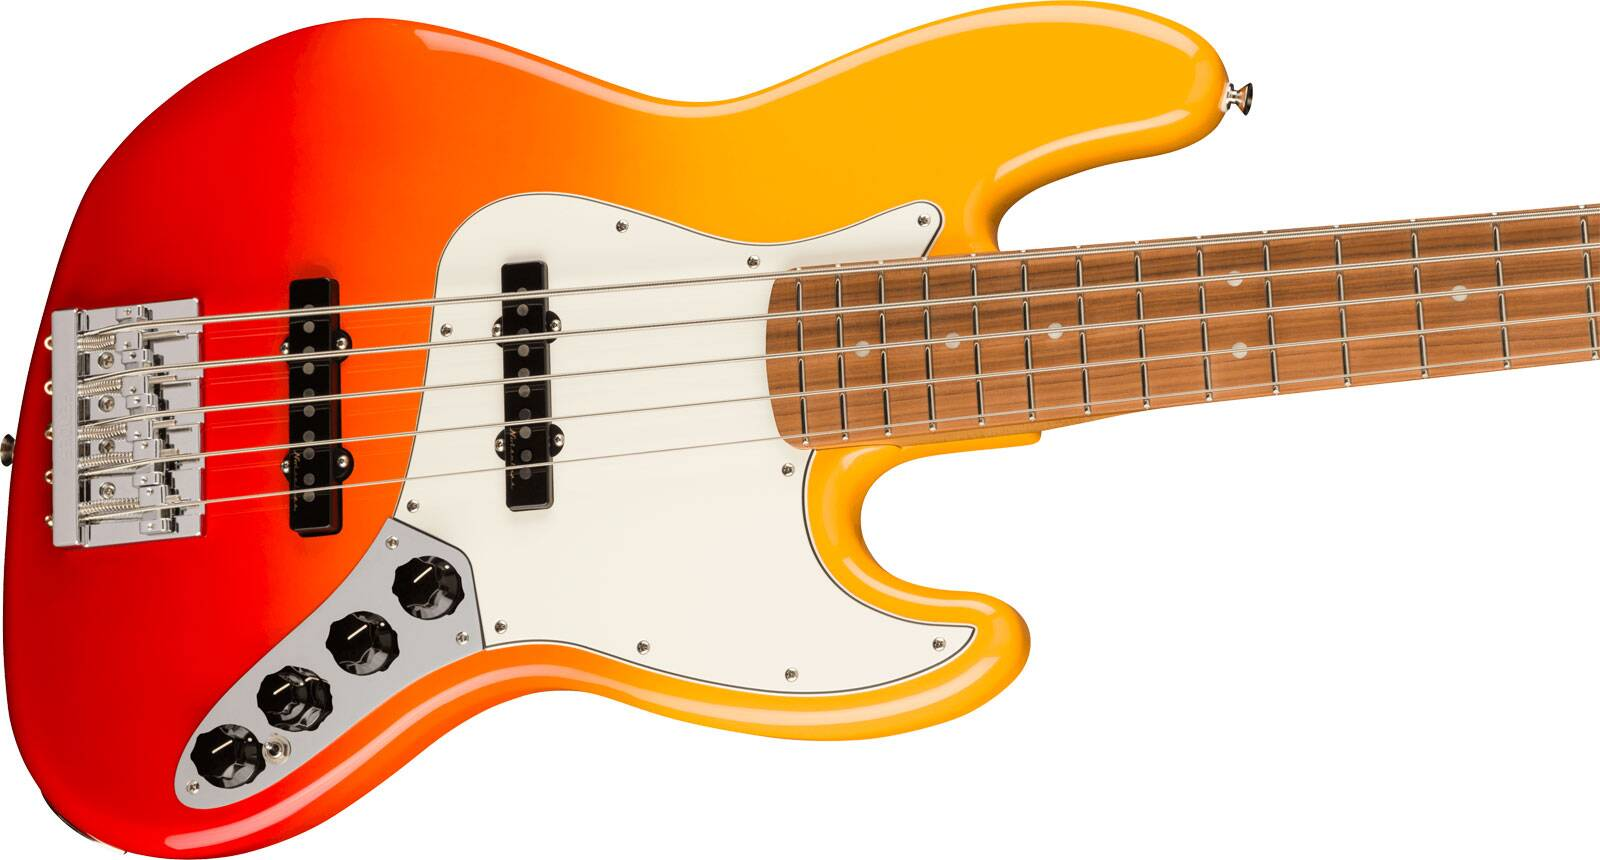 Fender Player Plus Jazz Bass V Pau Ferro Fingerboard Tequila Sunrise : photo 3